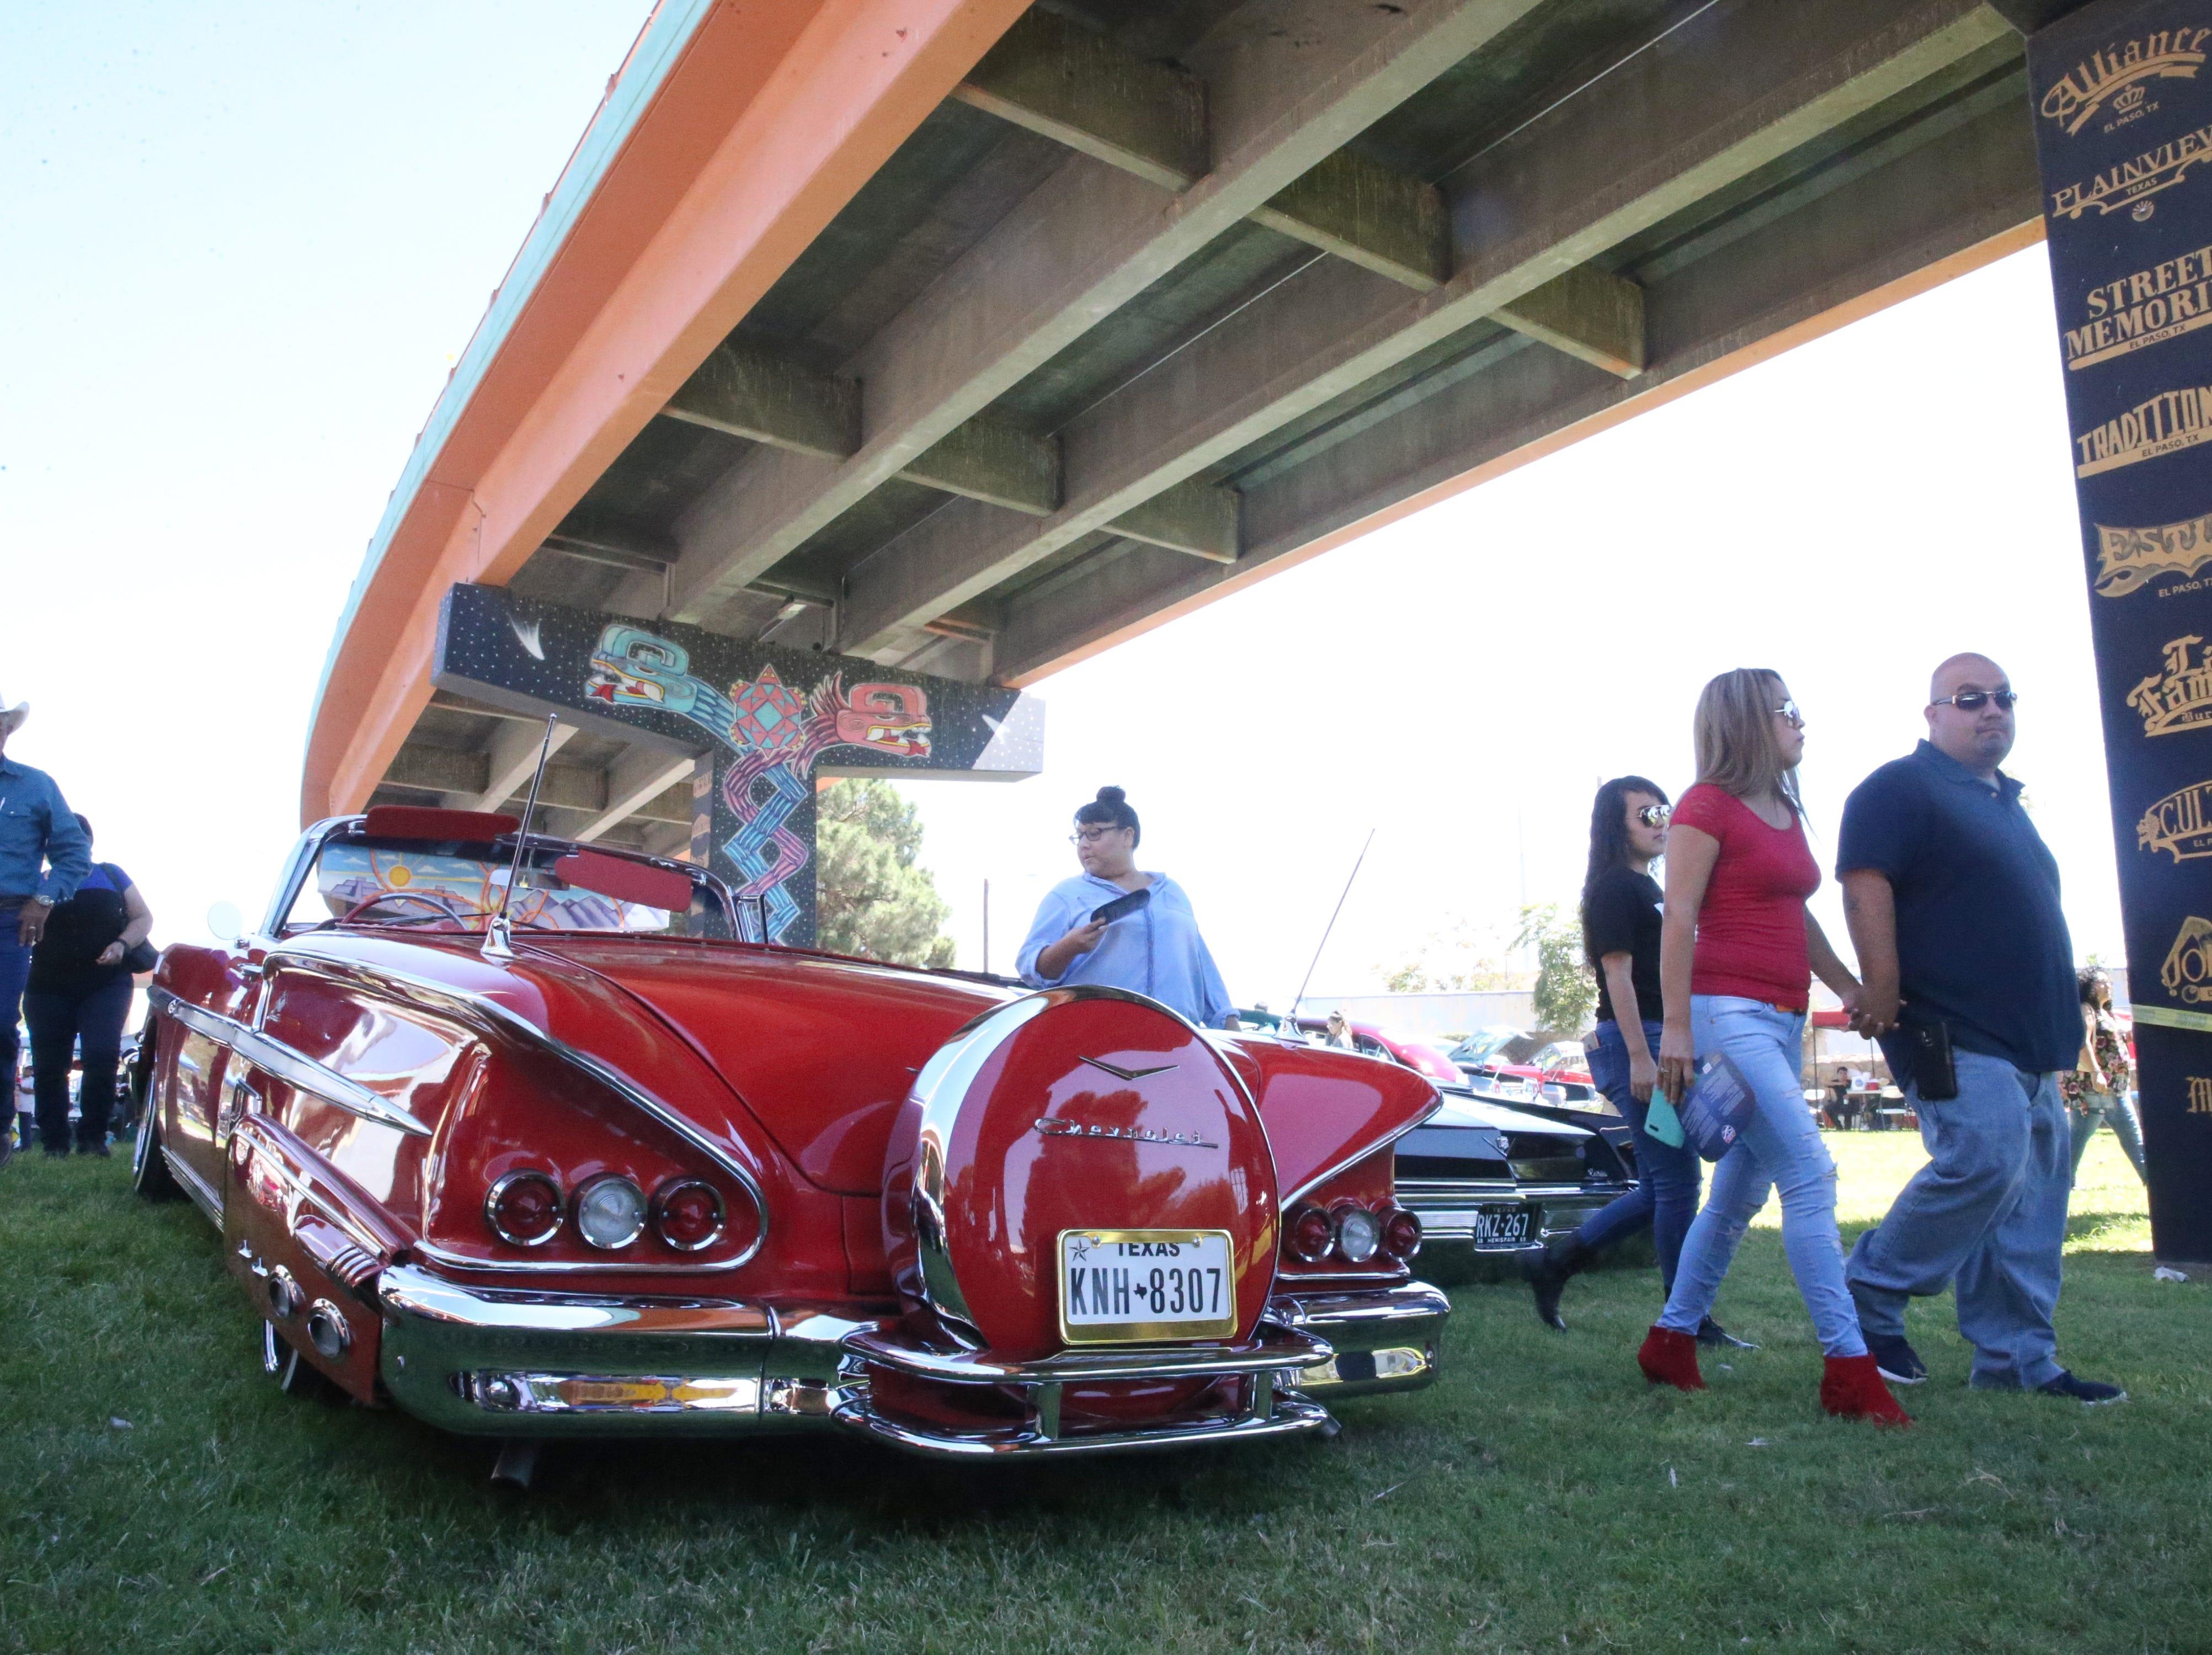 Back side of a 1958 Chevrolet Impala Sunday.